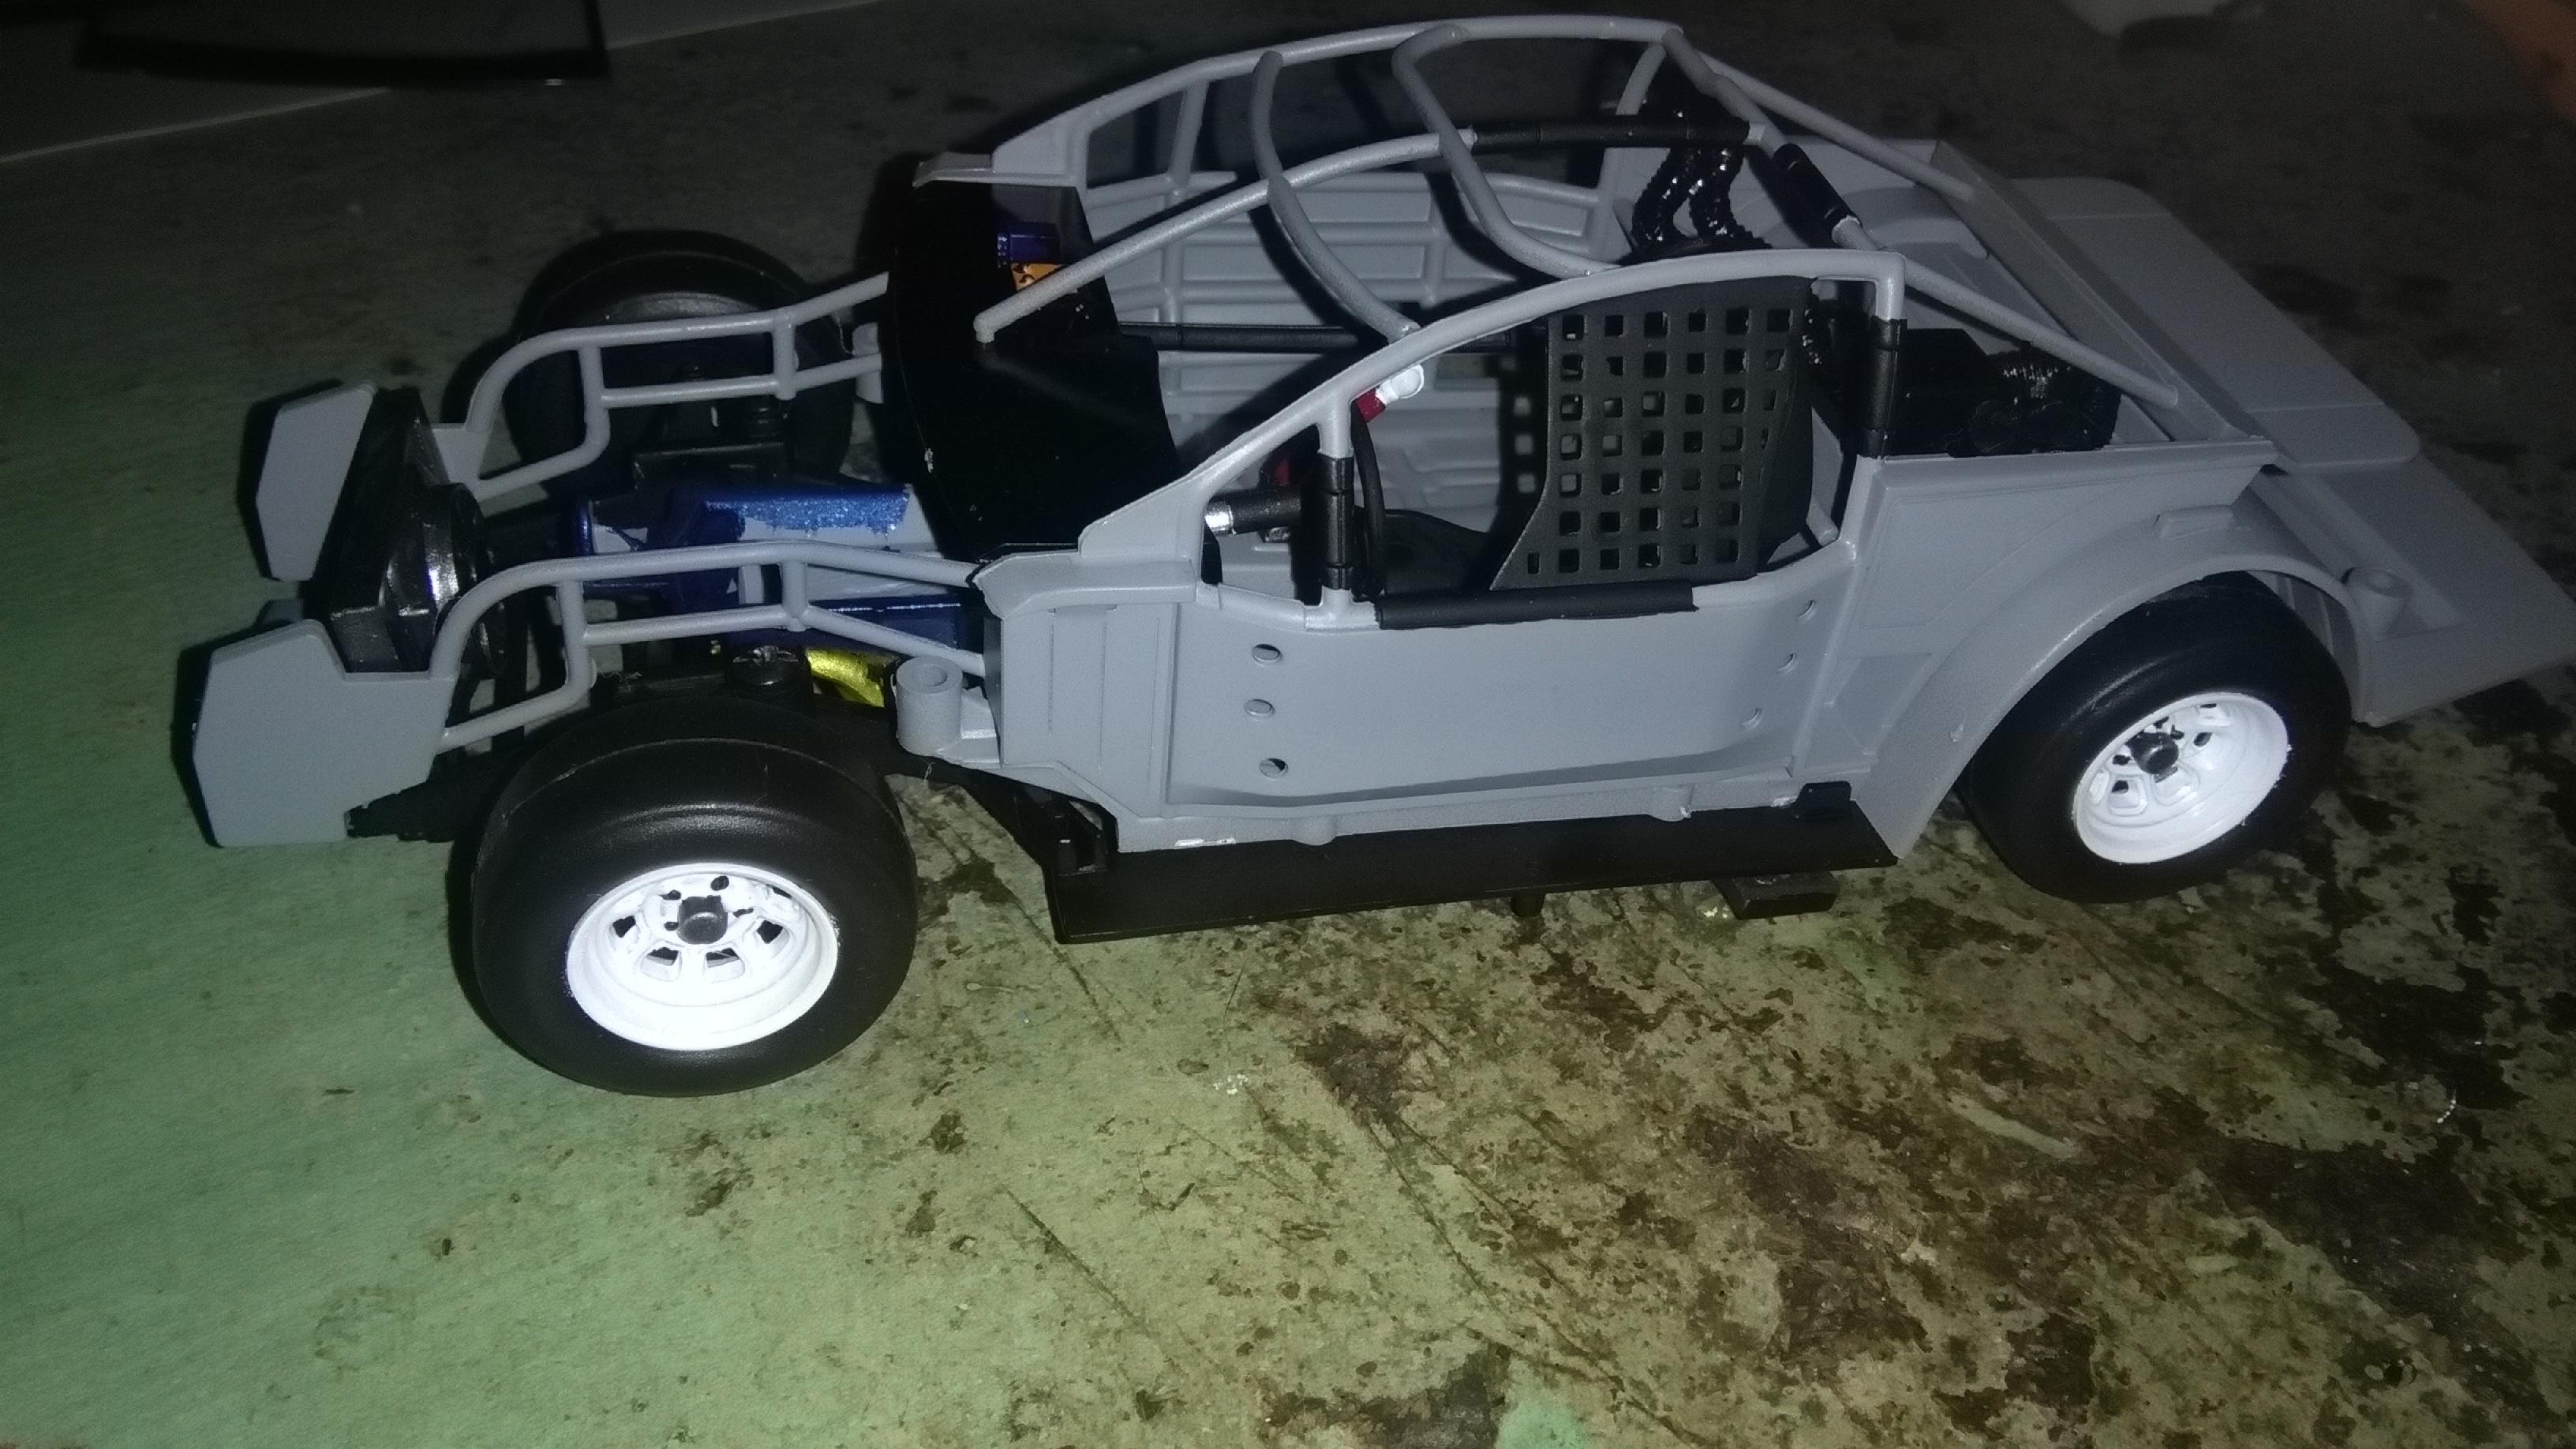 Ford Fusion Penskee 2014 #2 Brad K. Miller Lite - CHASE Version 823668F201329